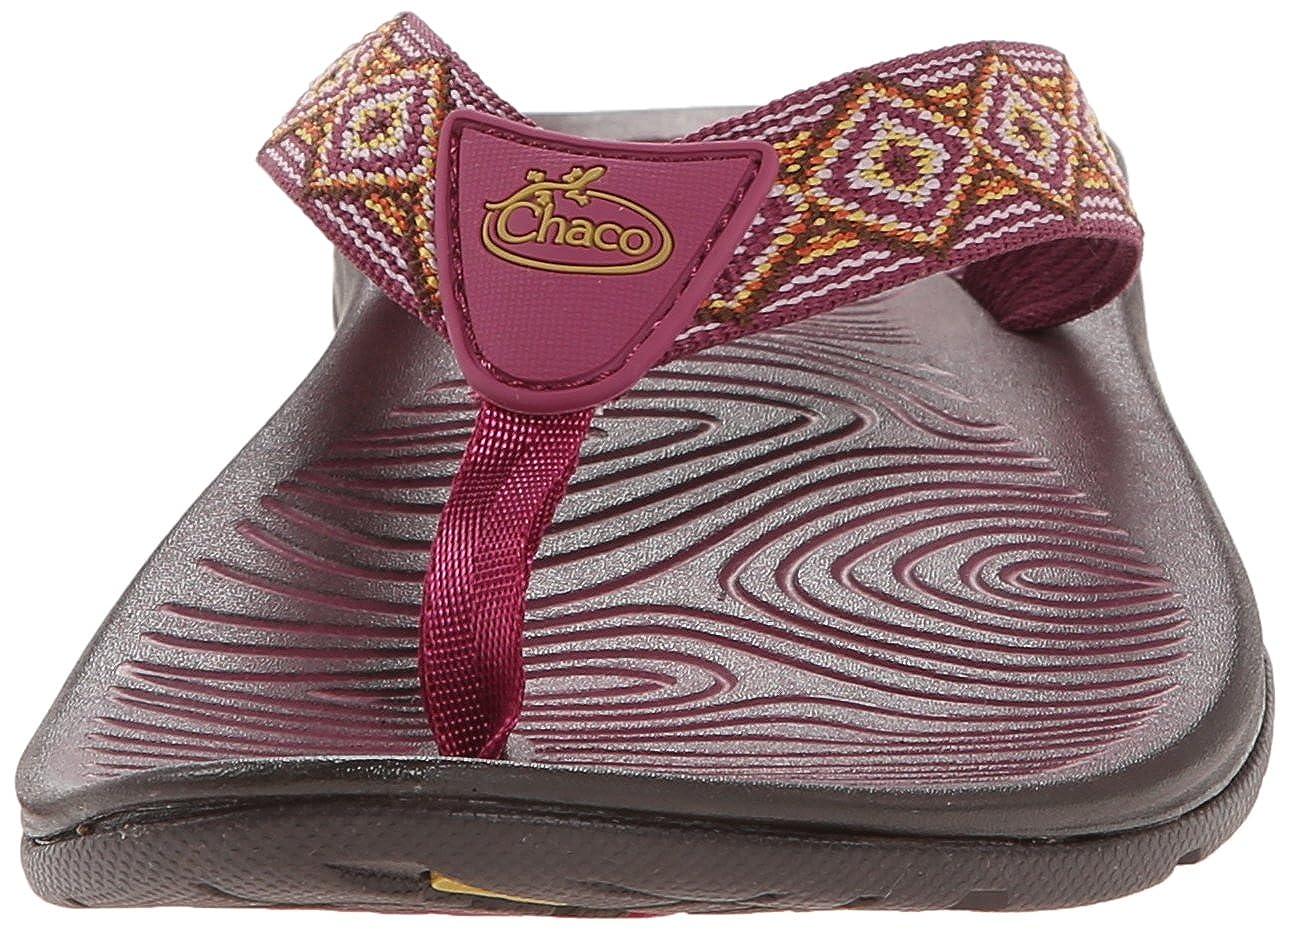 5038d096ded6 Chaco Women s Z Volv Flip Linked Diamonds 5 B - Medium  Amazon.co.uk  Shoes    Bags